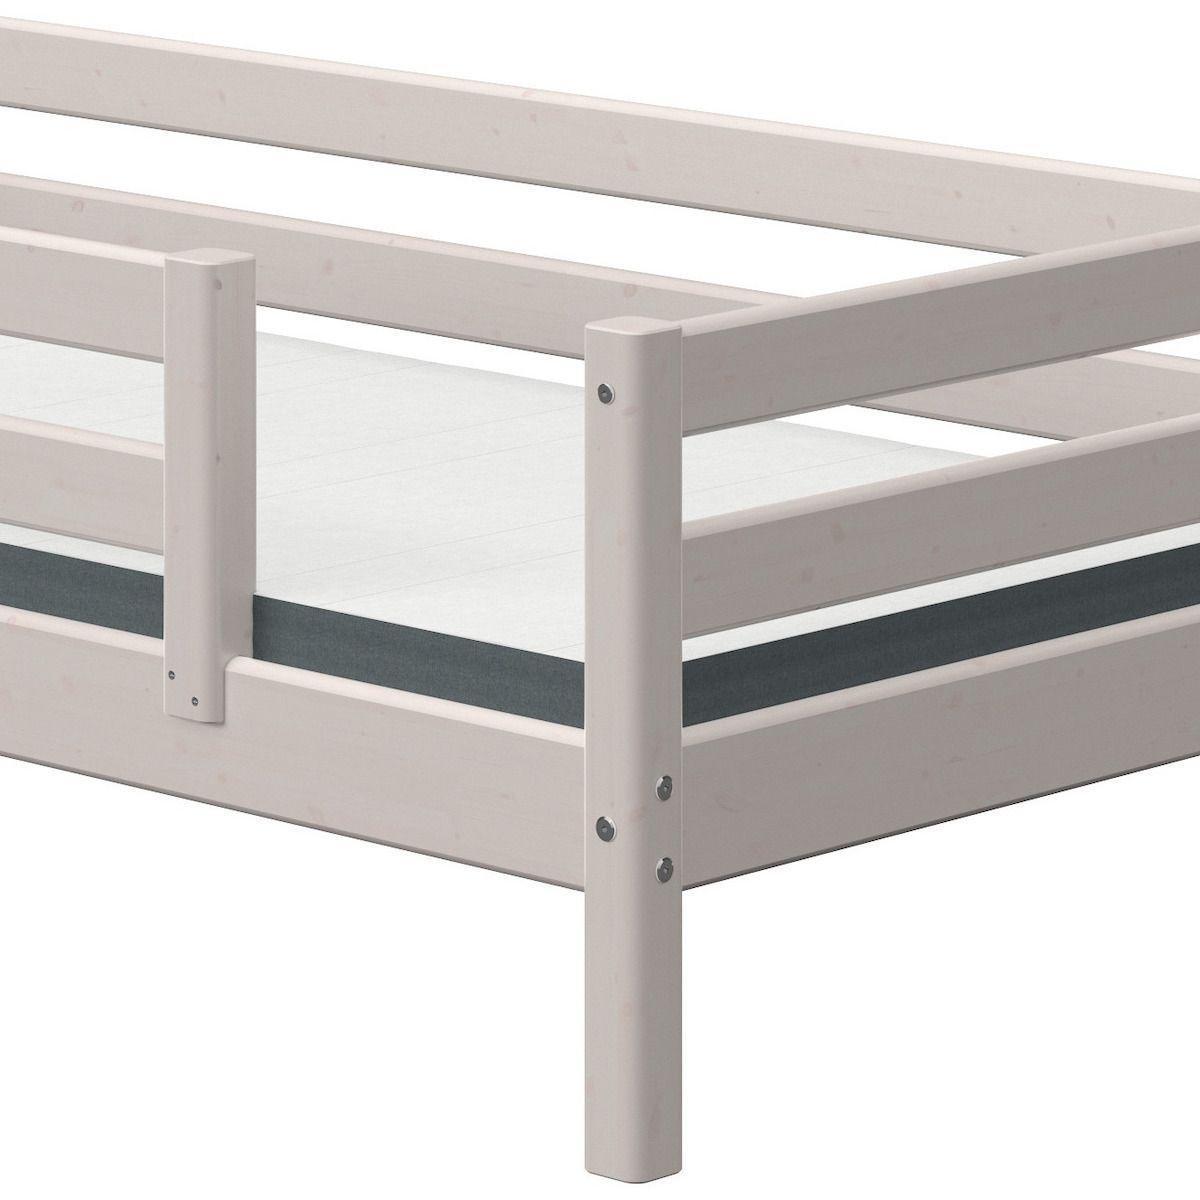 Cama-sofá 90x200cm barrera seguridad centrada CLASSIC Flexa grey washed